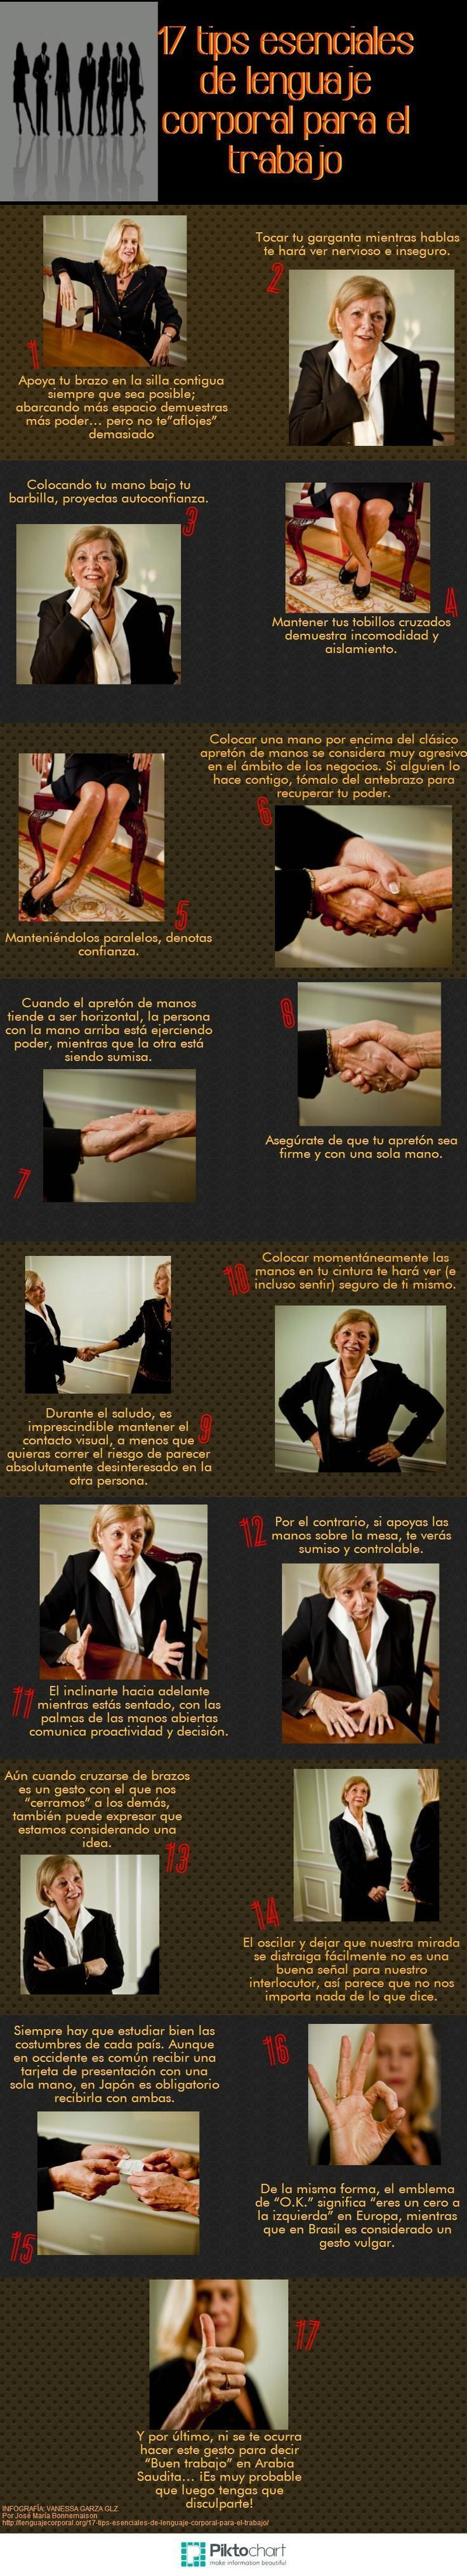 17 consejos lenguaje corporal para el trabajo #infografia #infographic #rrhh